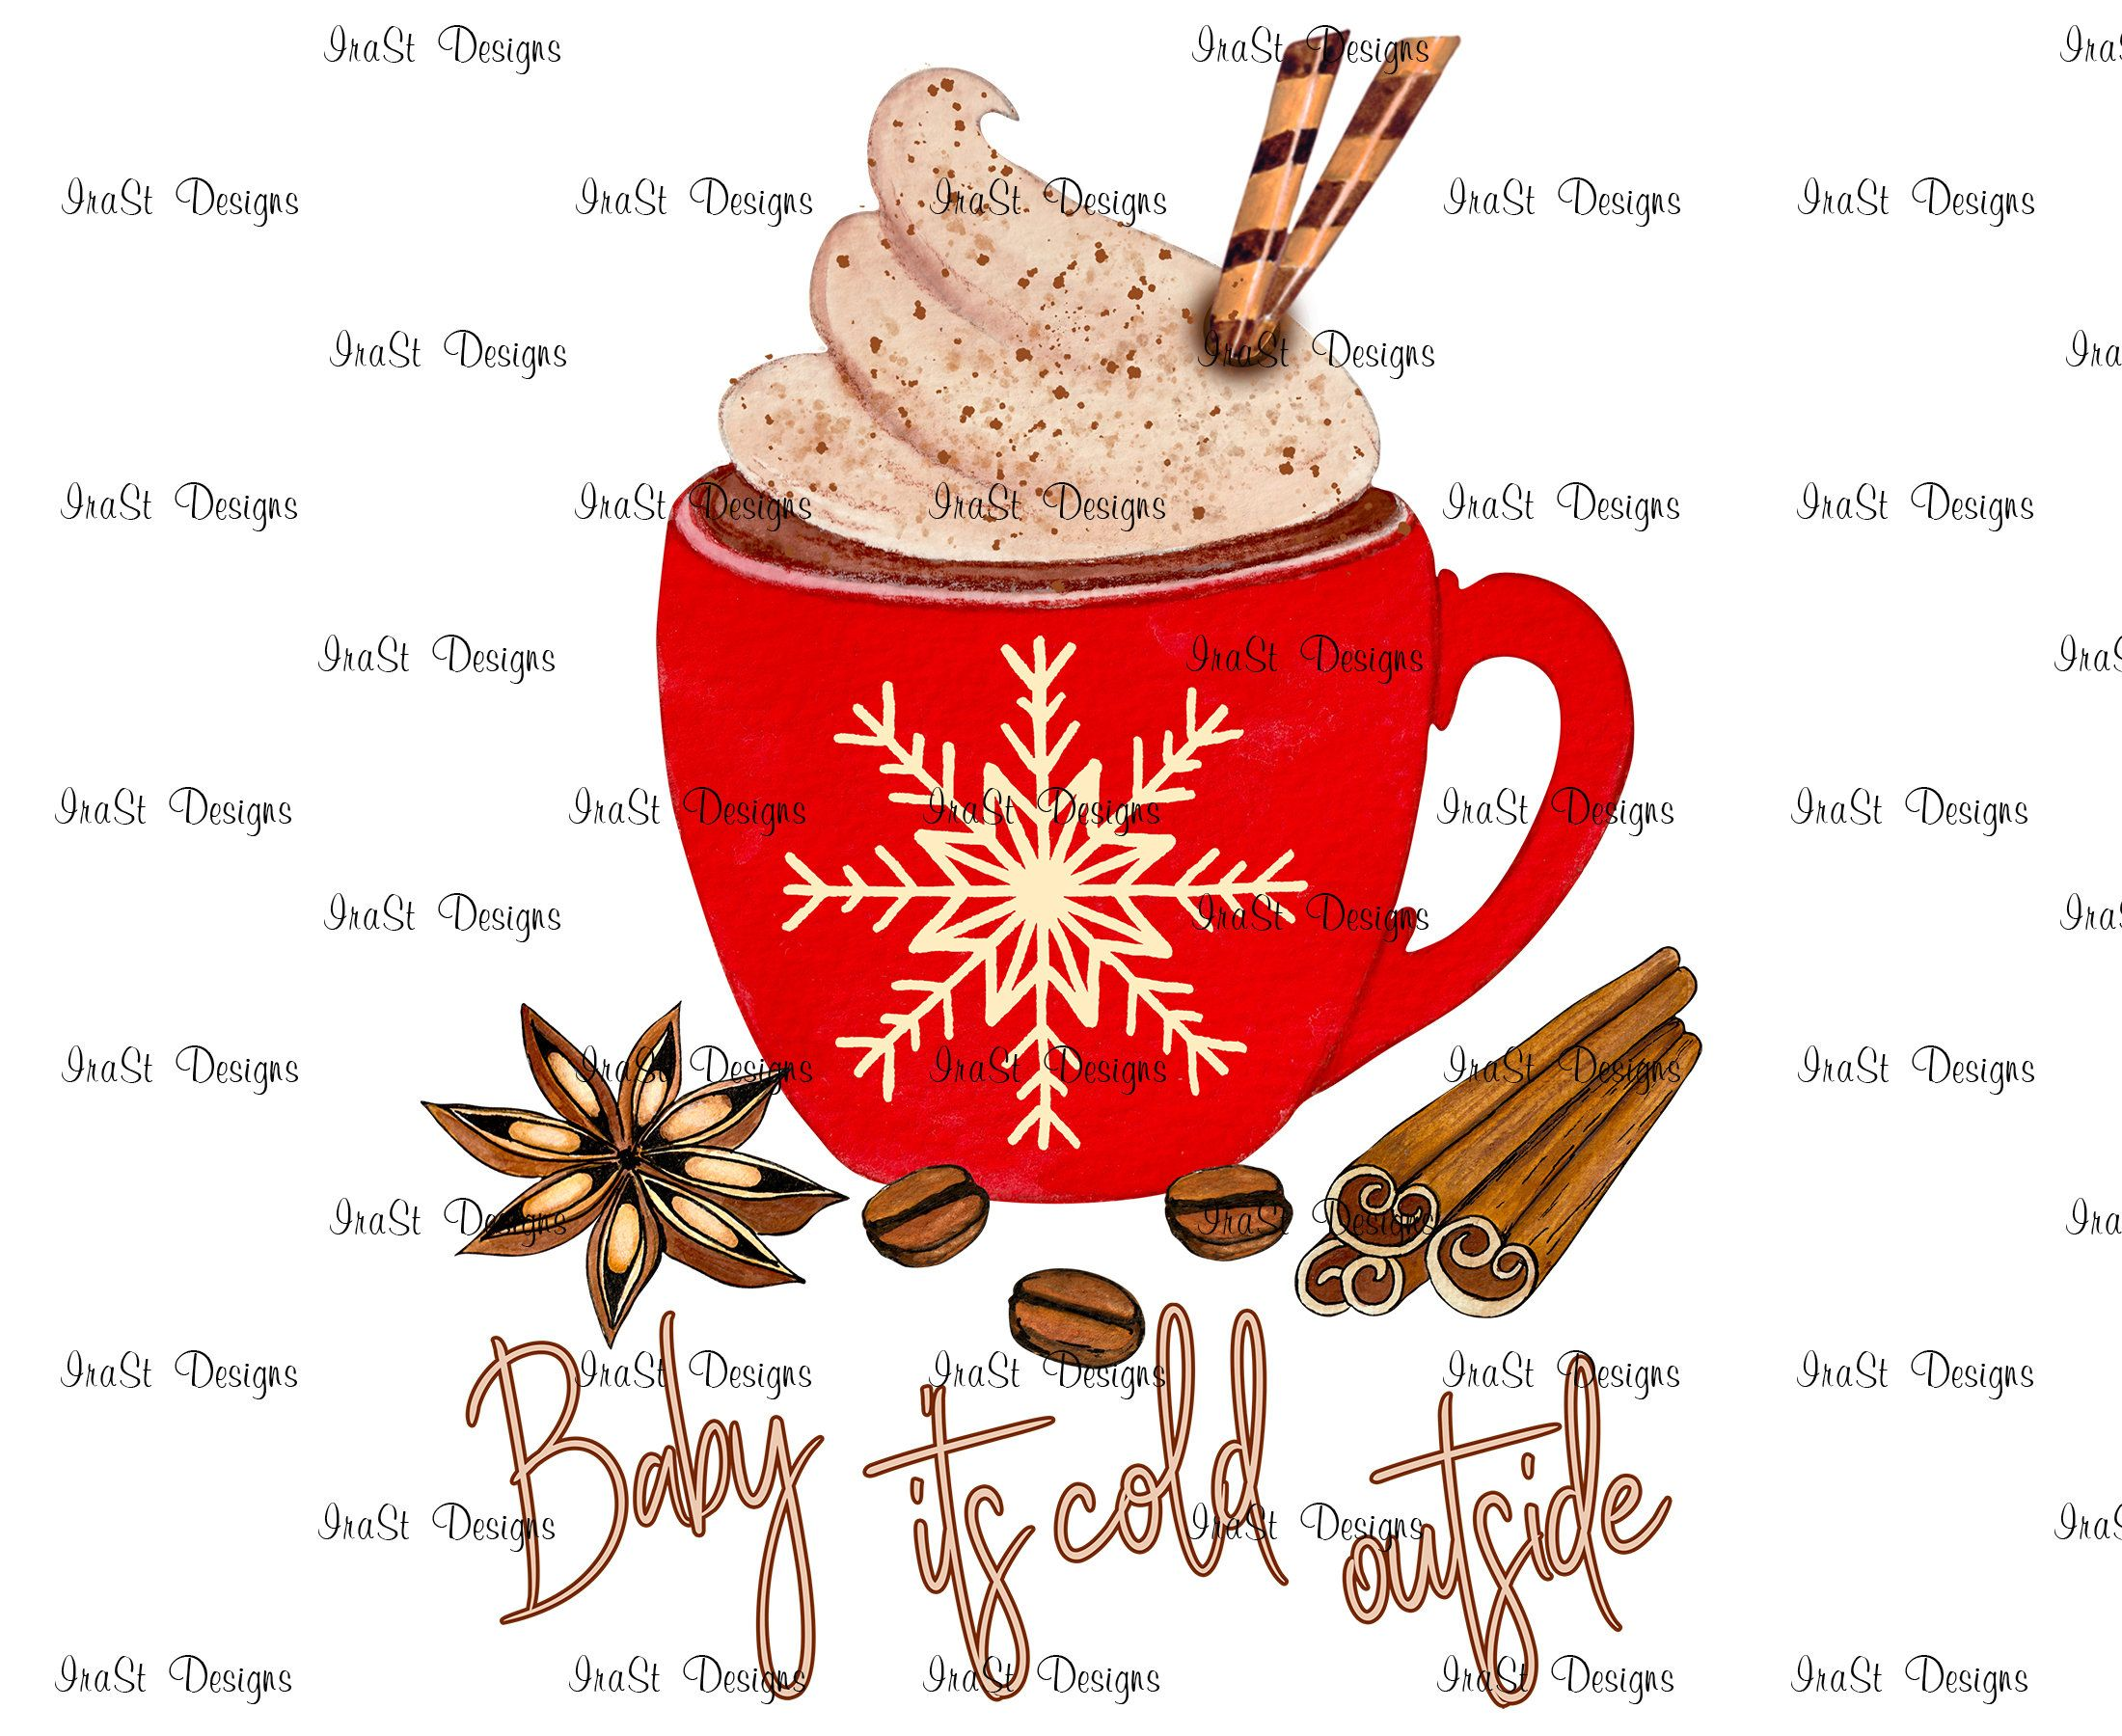 Baby Its Cold Outside Sublimation Png Christmas Mug Etsy Baby Cold Christmas Mugs Hot Chocolate Drawing